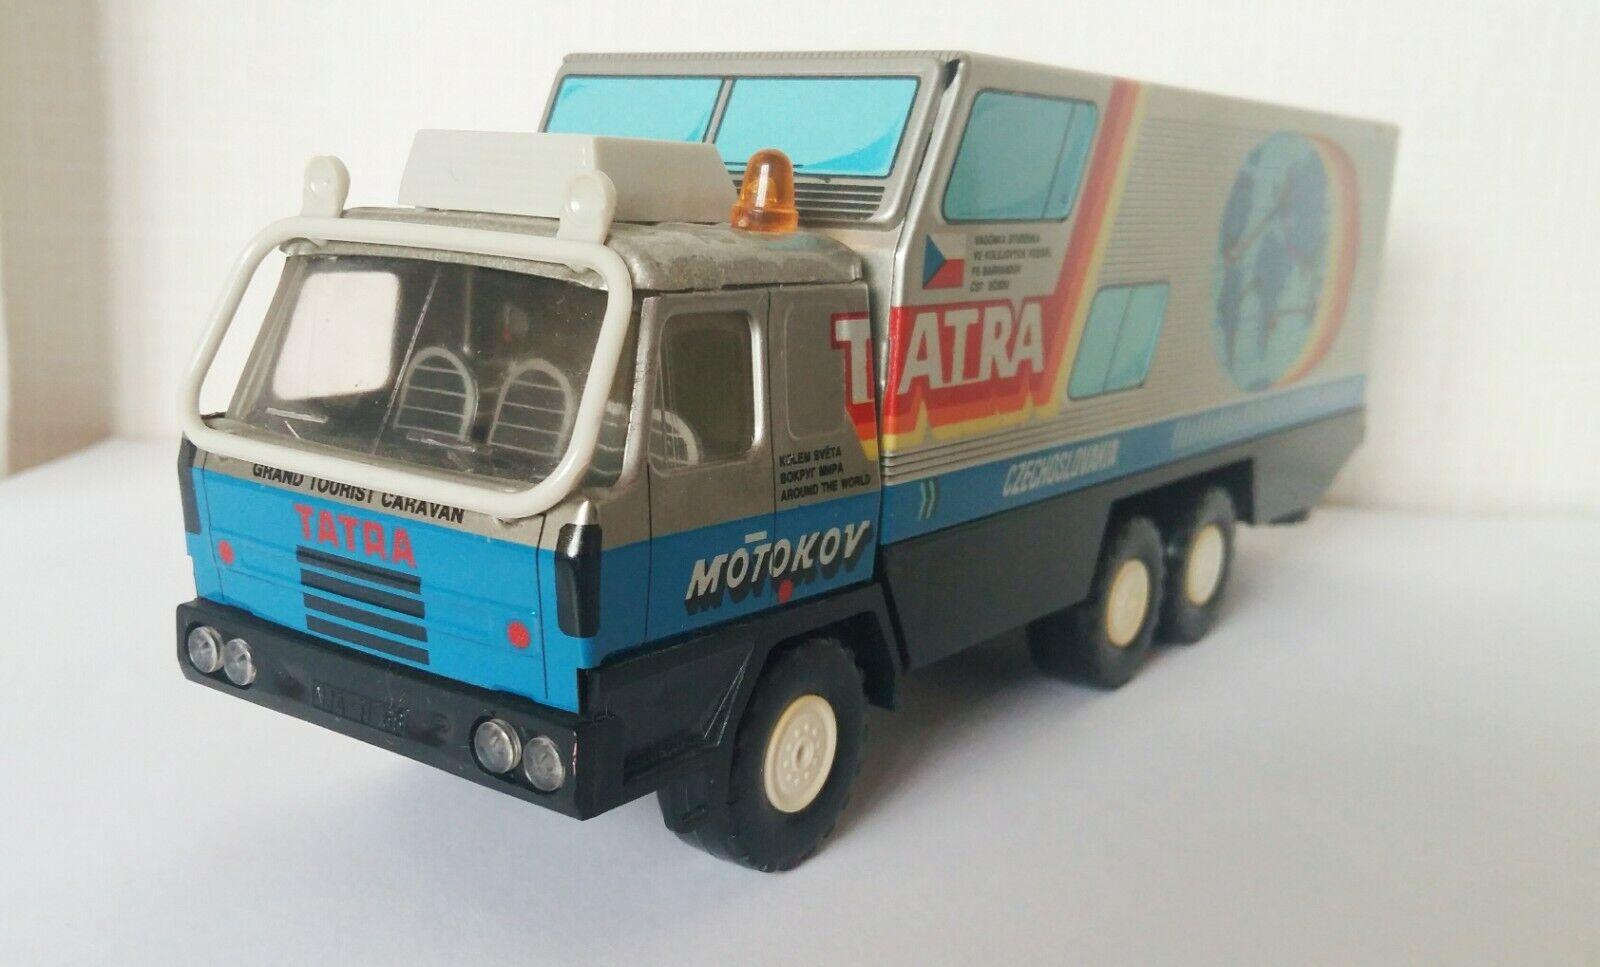 Tatra T815 Motokov Grand Tourist Caravan Truck 1 43 made in Czechoslovakia